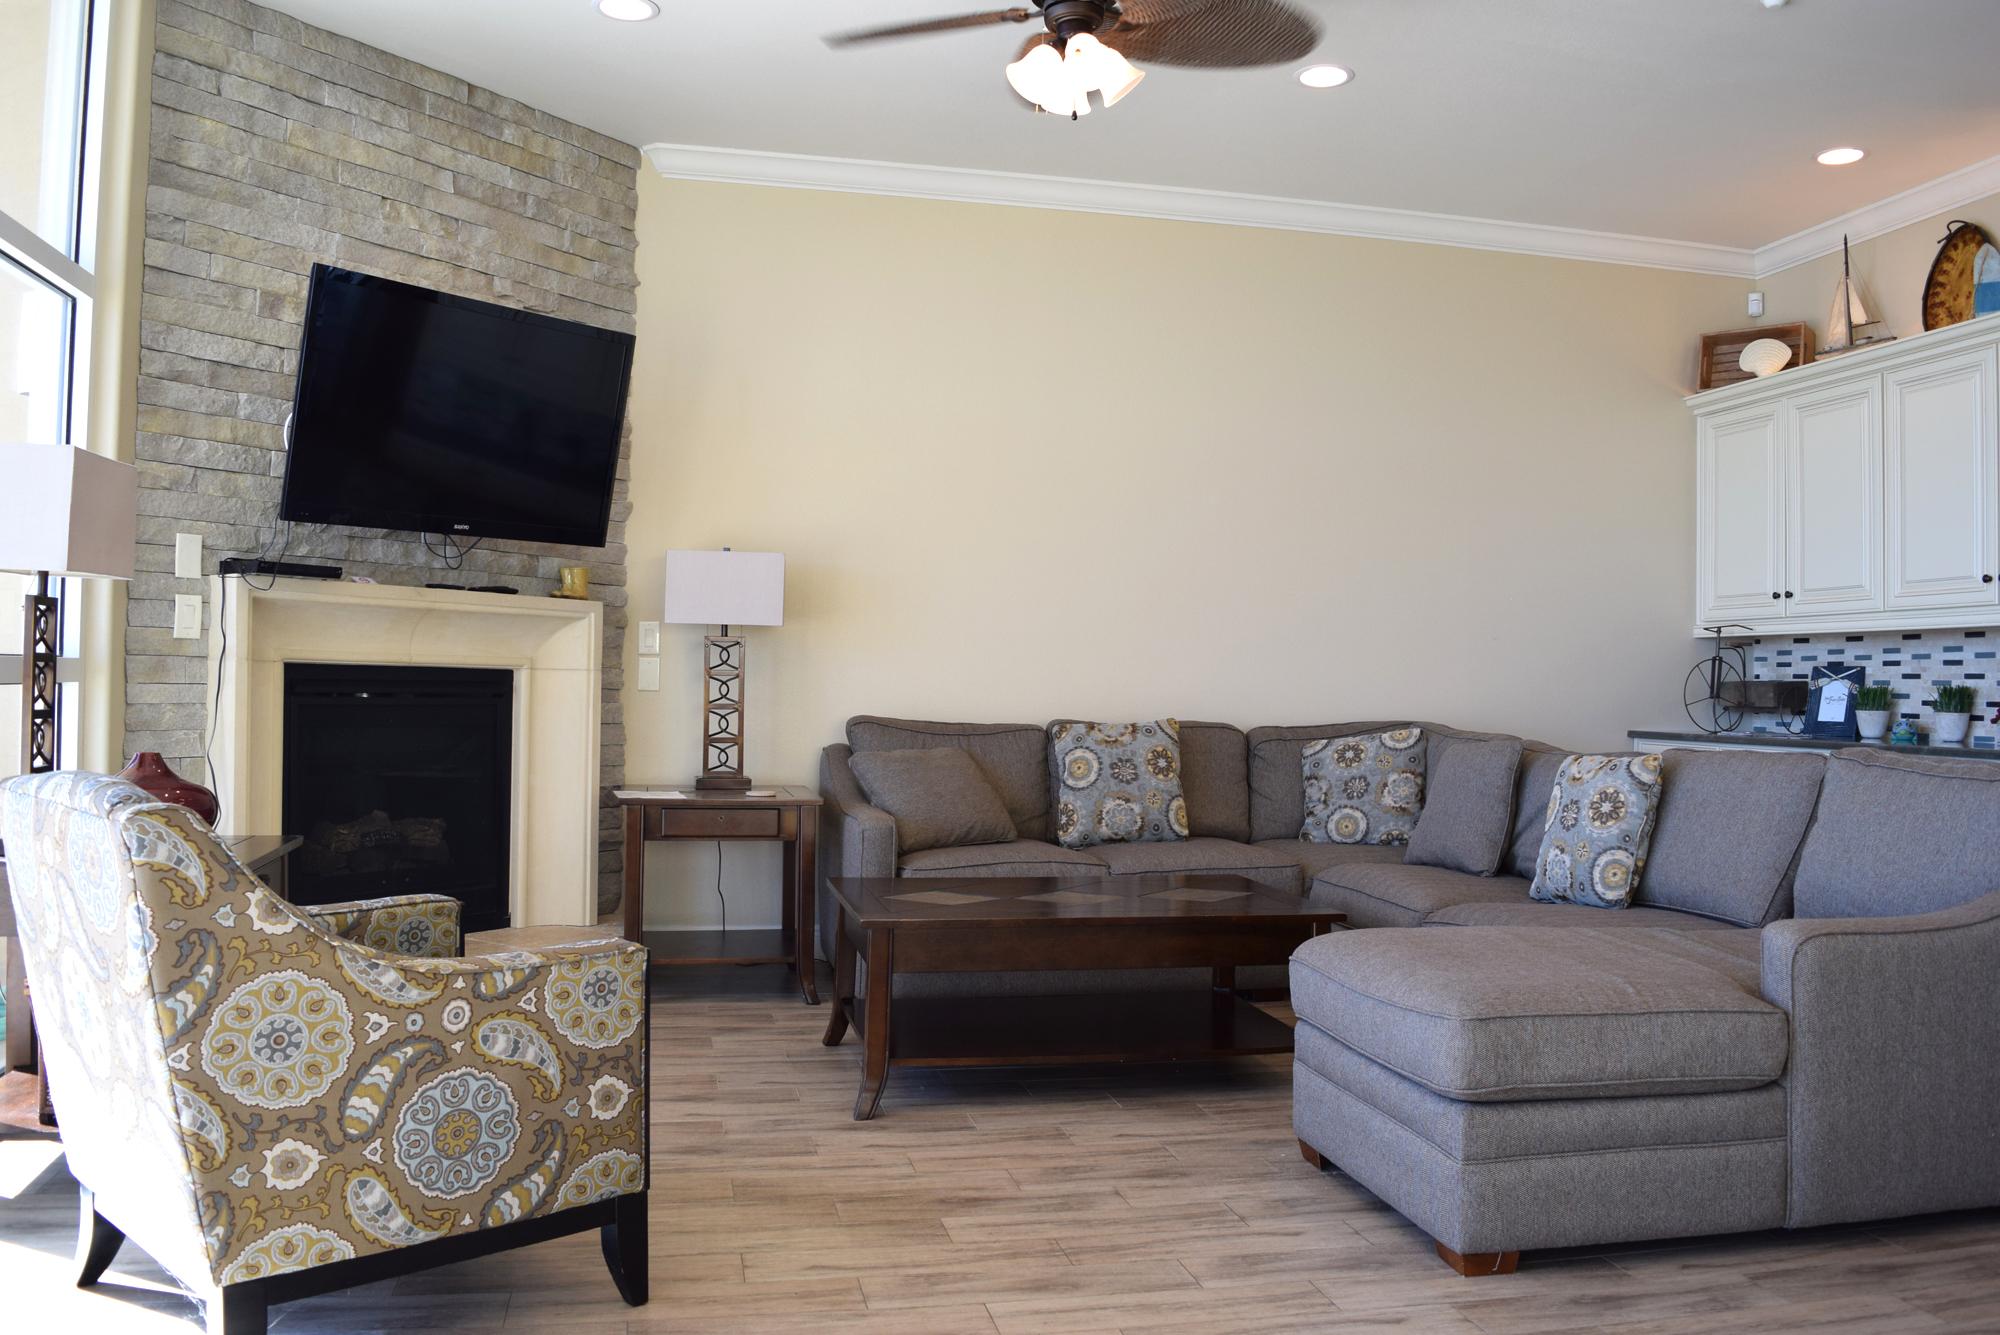 Regency Cabanas #B1 Condo rental in Regency Cabanas Pensacola Beach in Pensacola Beach Florida - #6